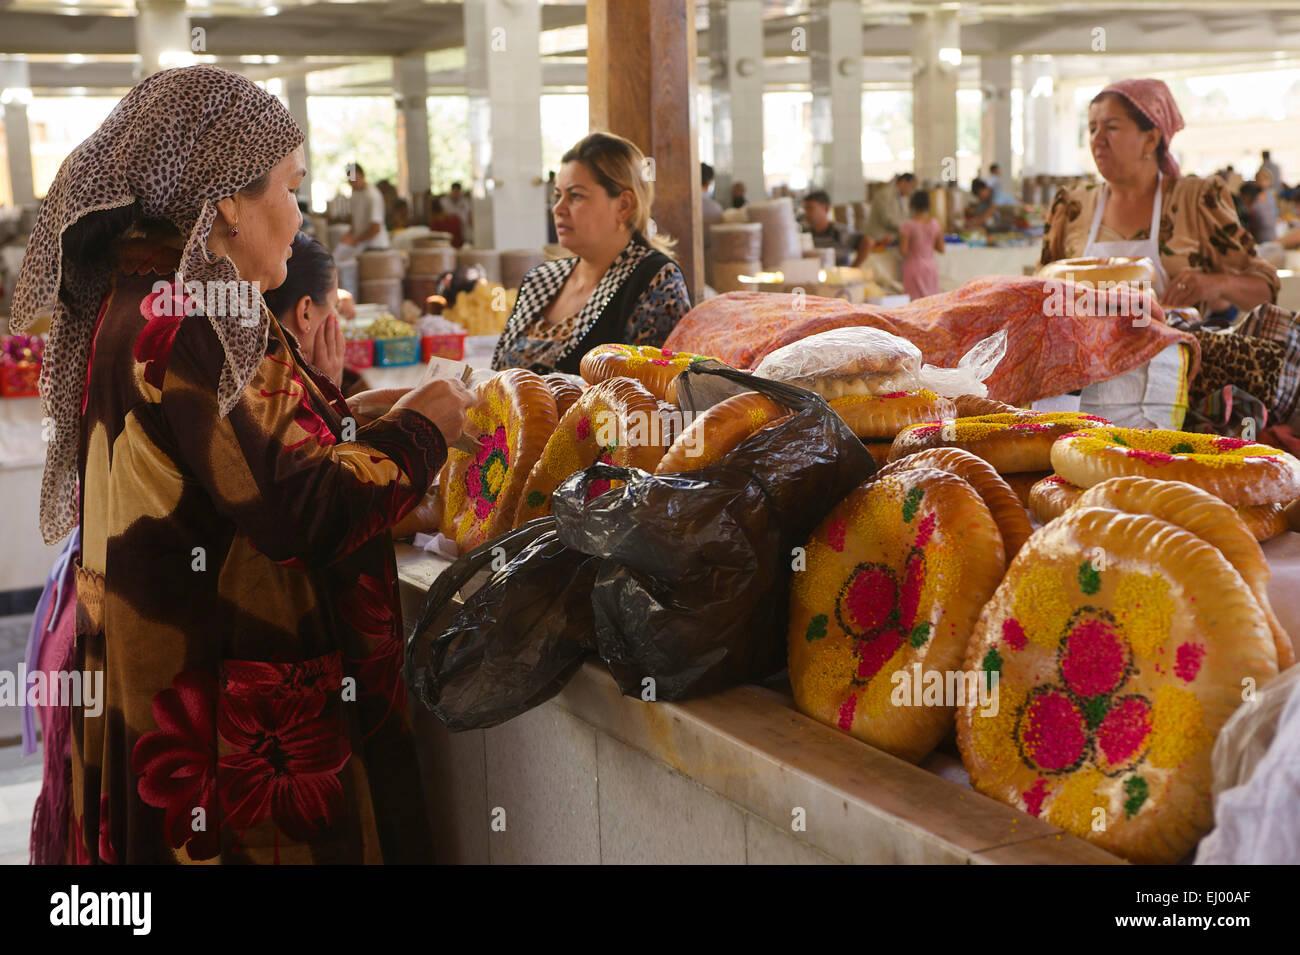 Asia Uzbekistan Central Silk Road Inside Day Market Stall State Sales Stand Bazaar Samarkand Food Peopl